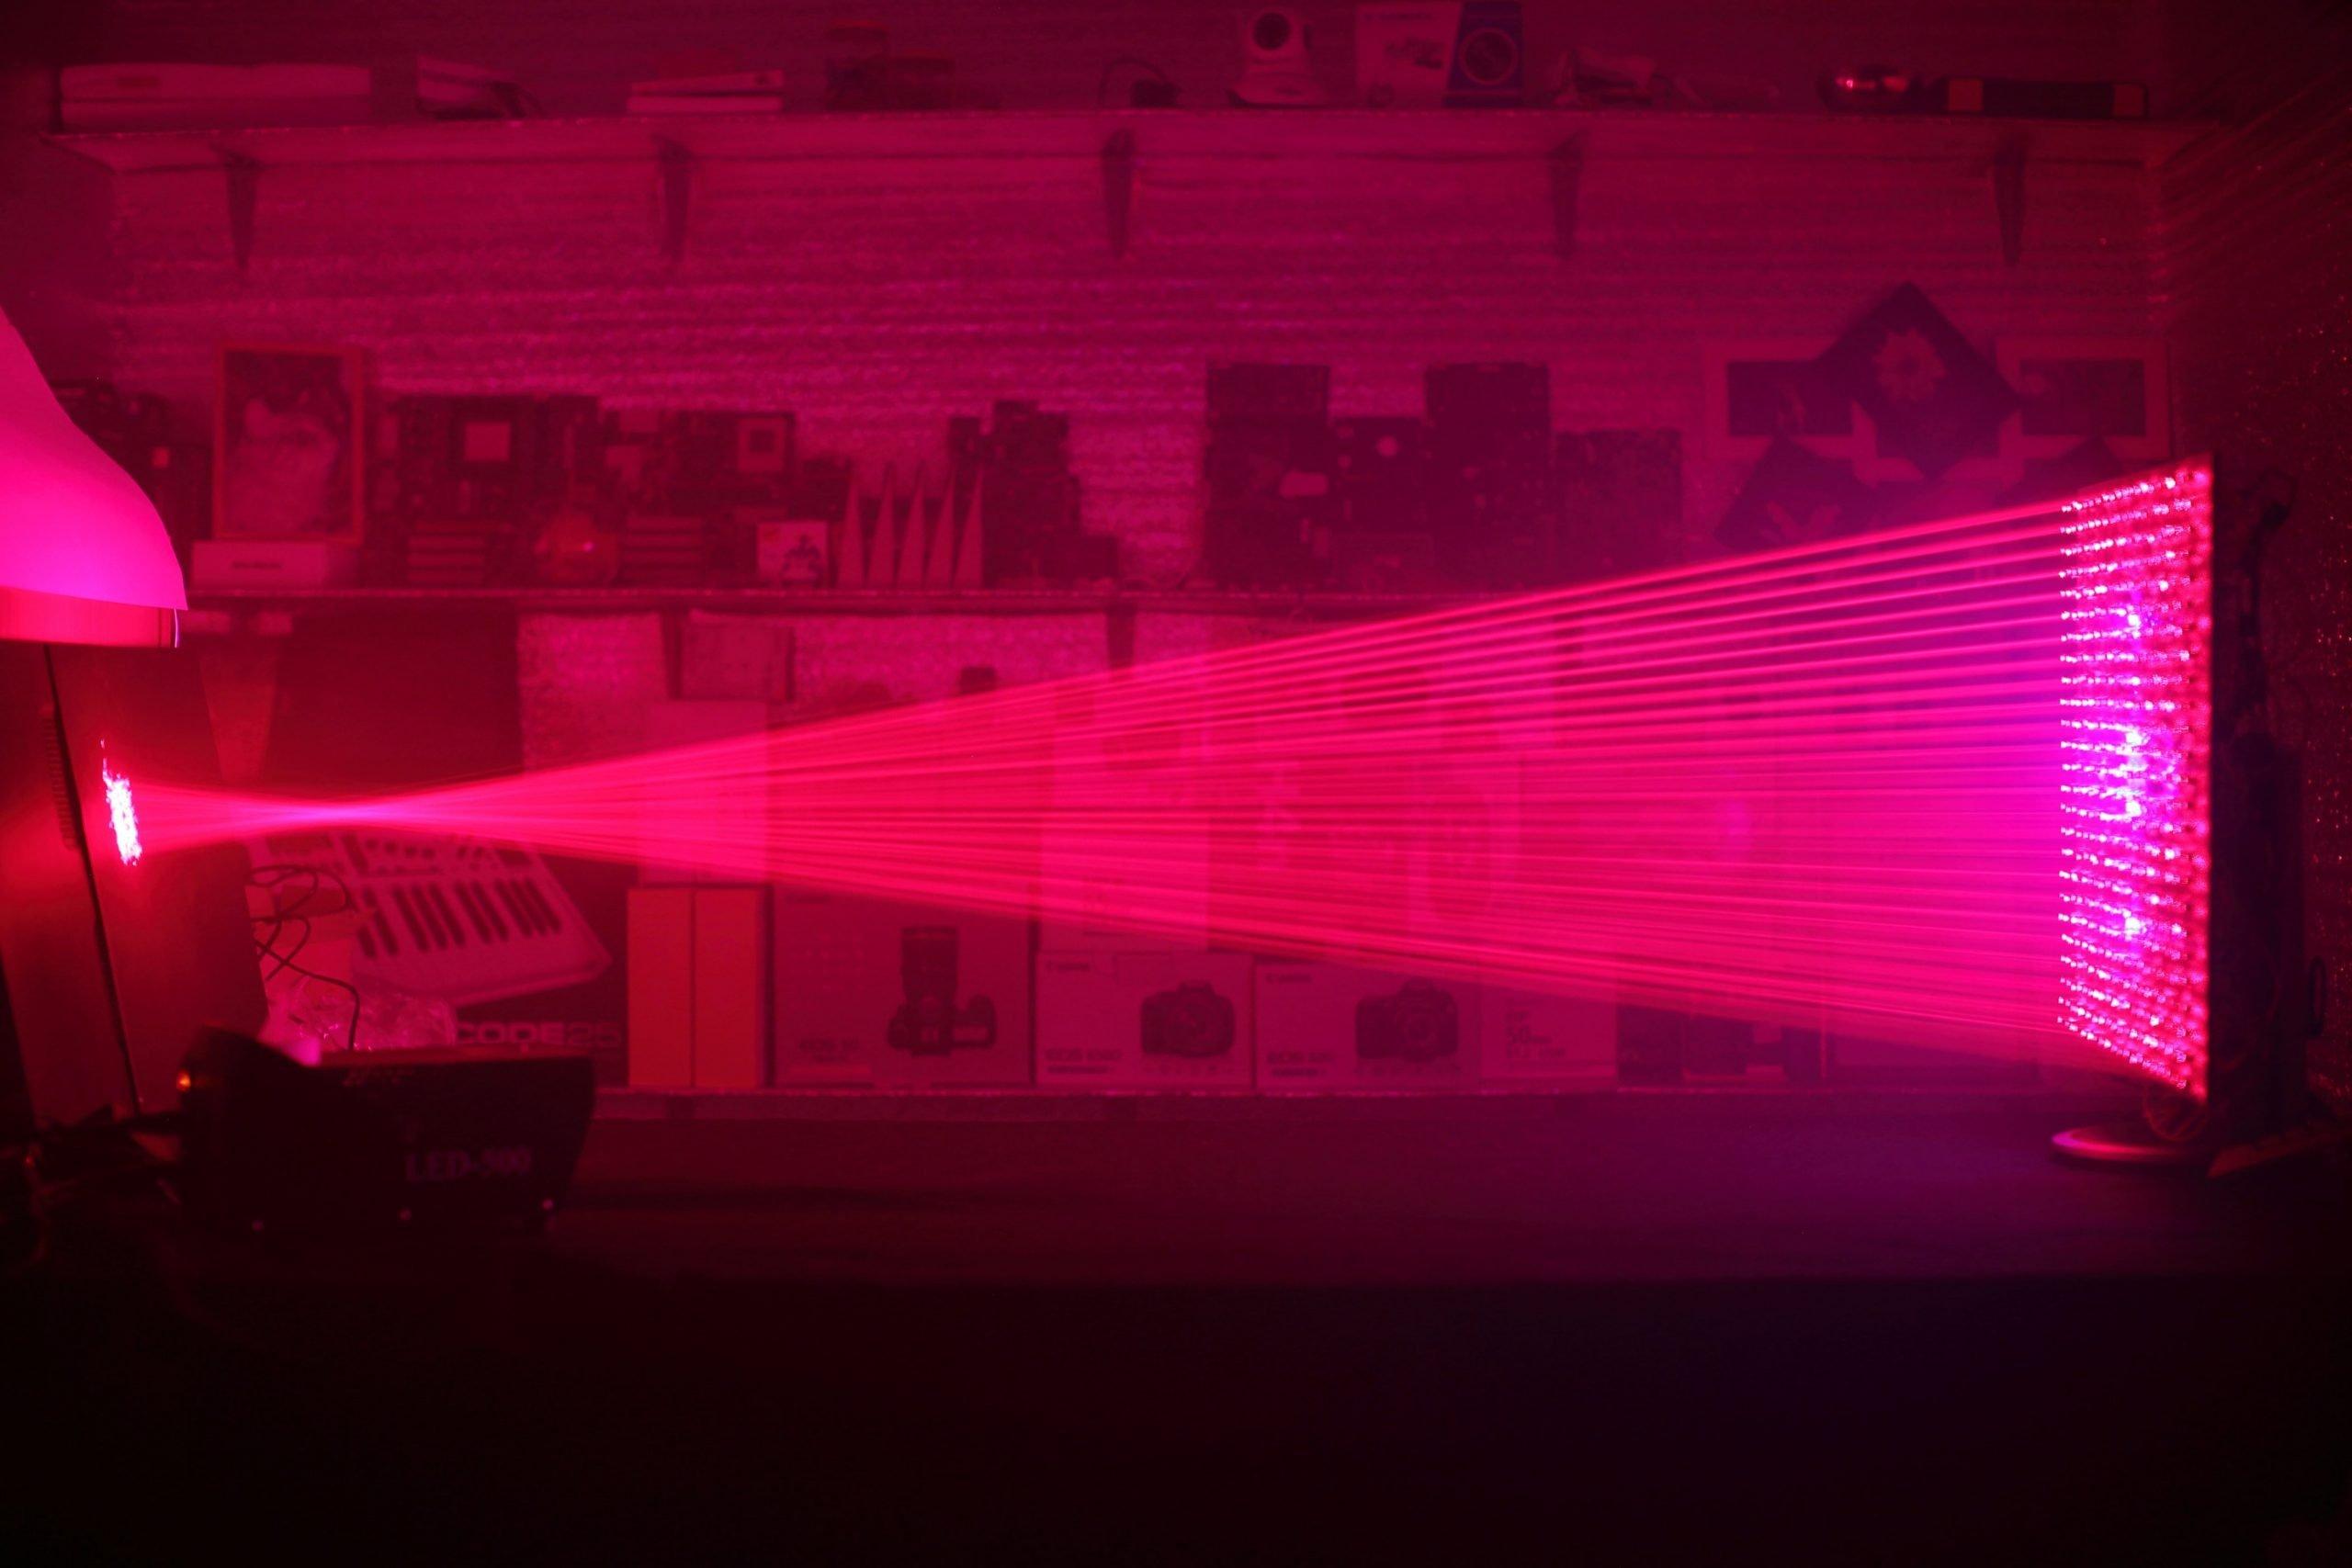 500 laserosoitin-komponenttia